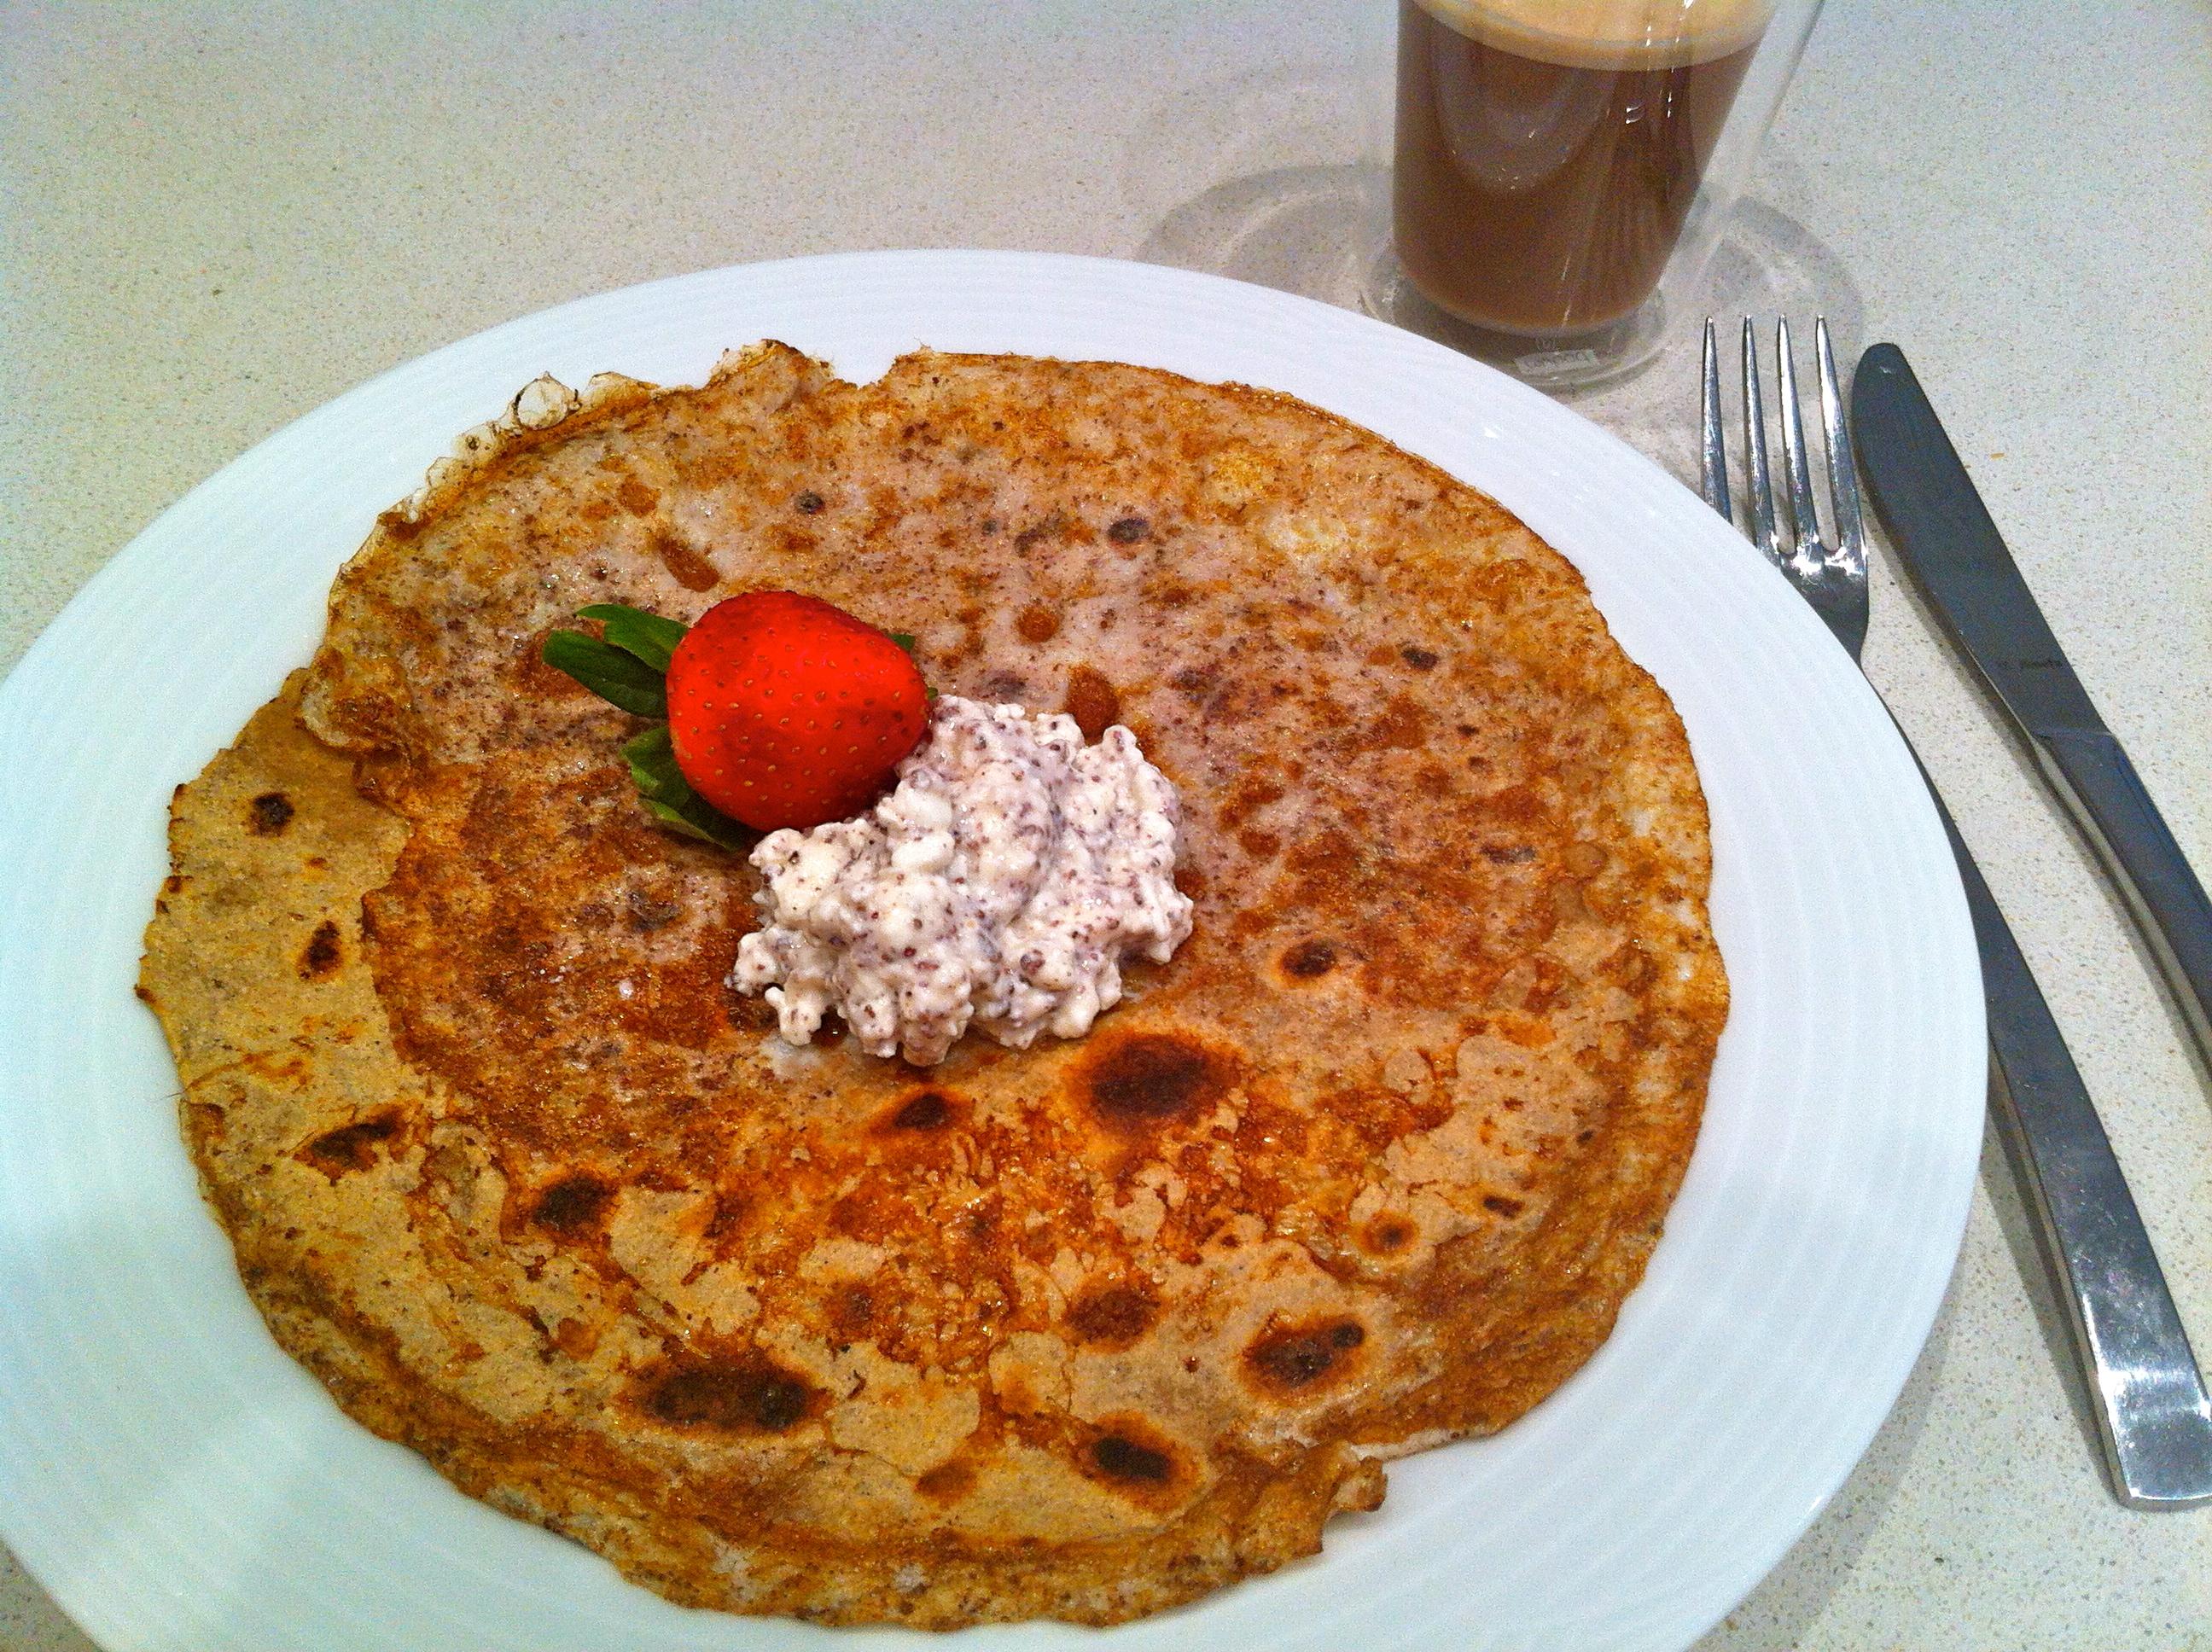 High protein, high fibre, no added sugar, chocolate, coconut, pancake!